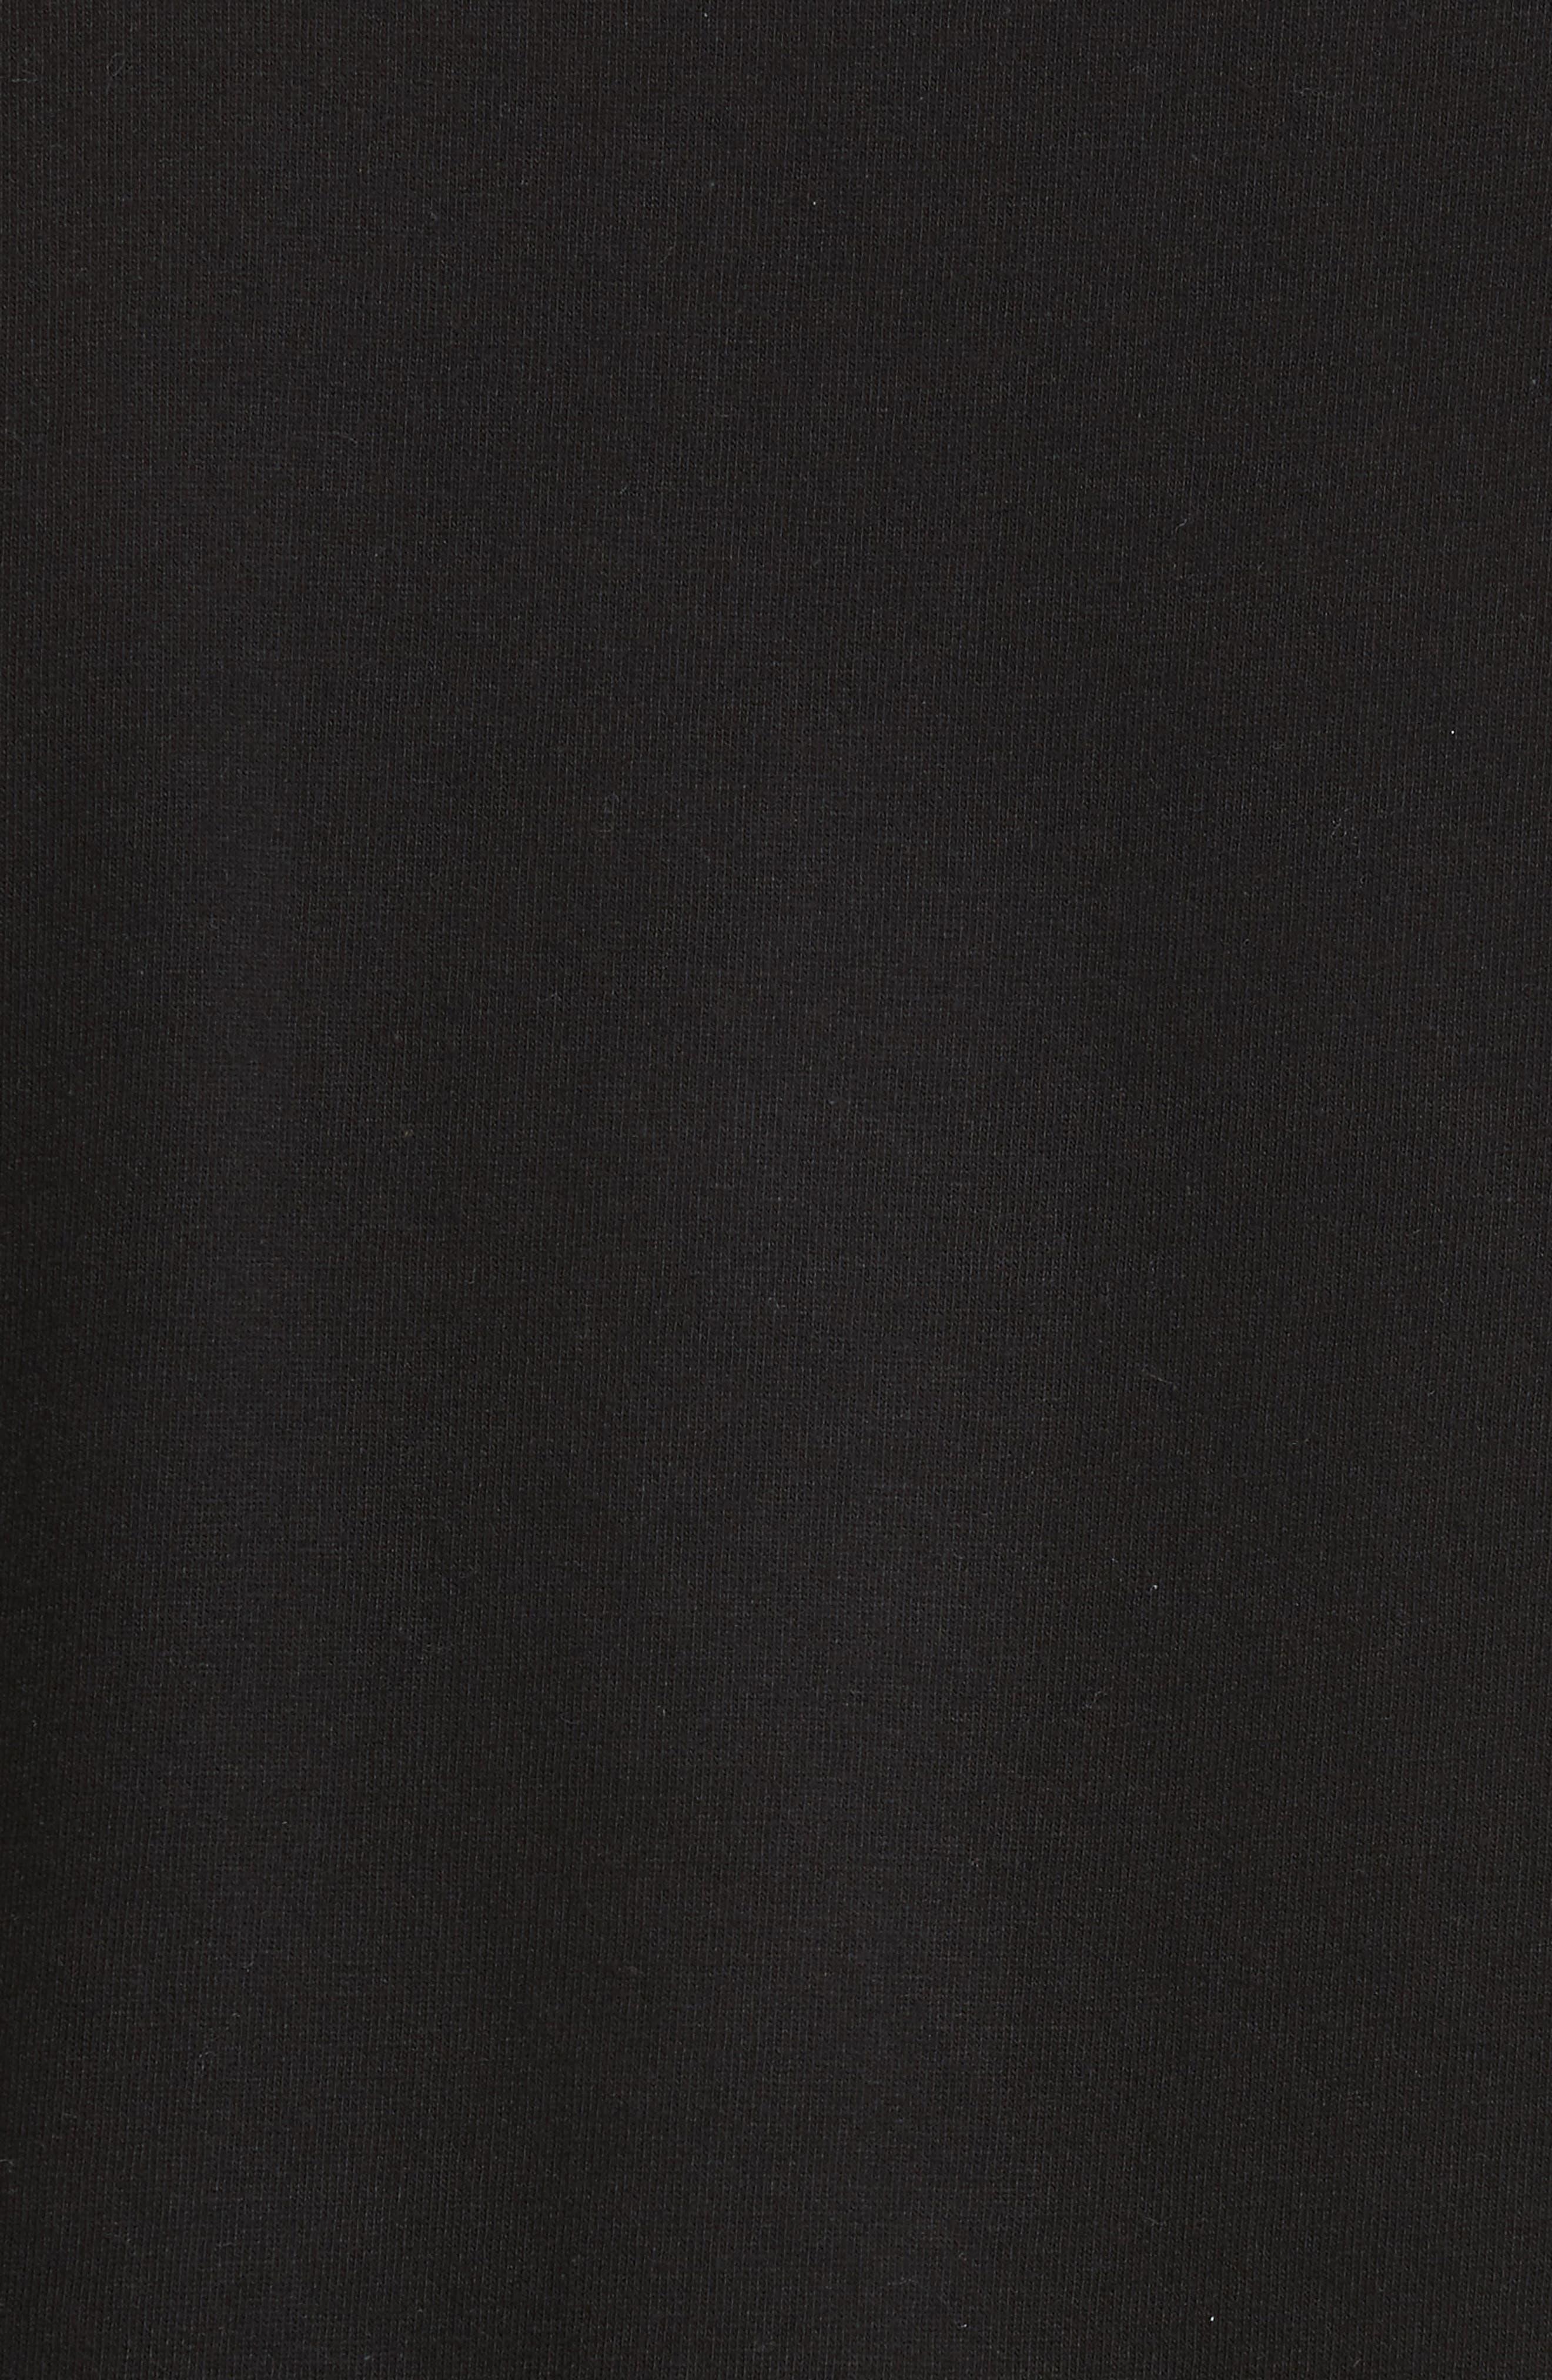 Comme des Garçons PLAY X-Ray Heart Logo T-Shirt,                             Alternate thumbnail 5, color,                             Black